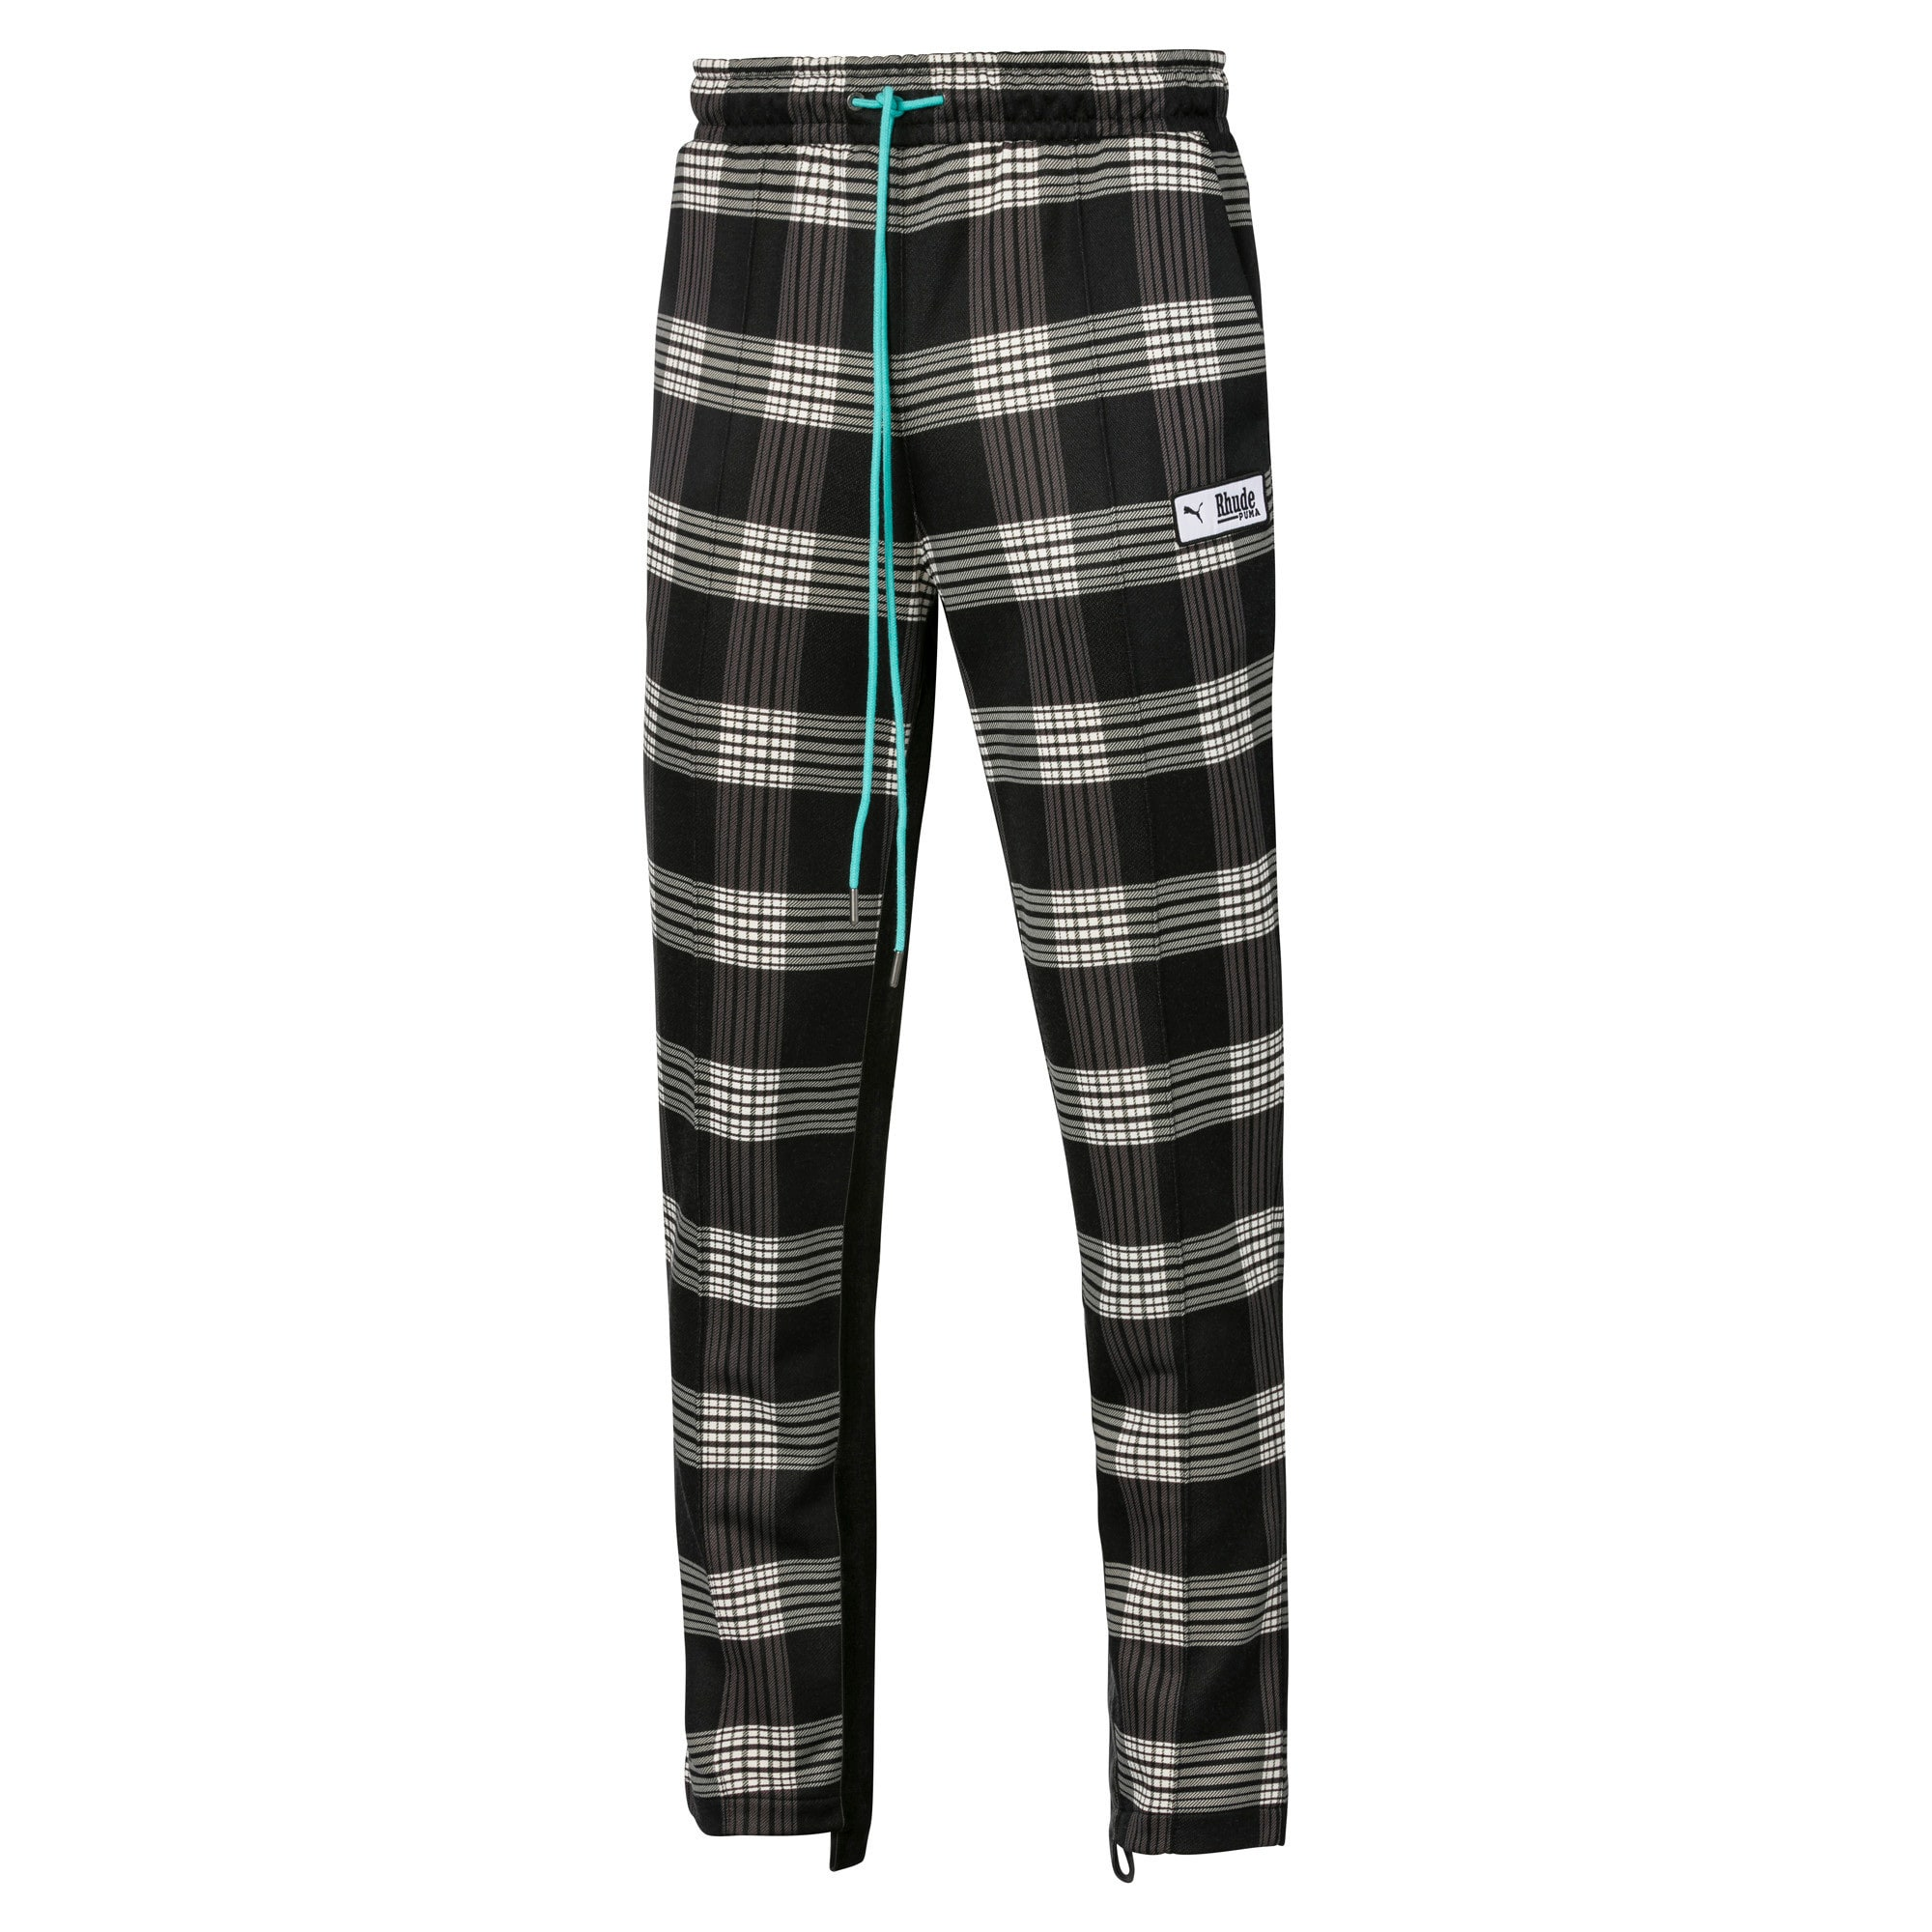 Anteprima 1 di PUMA x RHUDE All-Over Print Knitted Men's Track Pants, Puma White AOP, medio